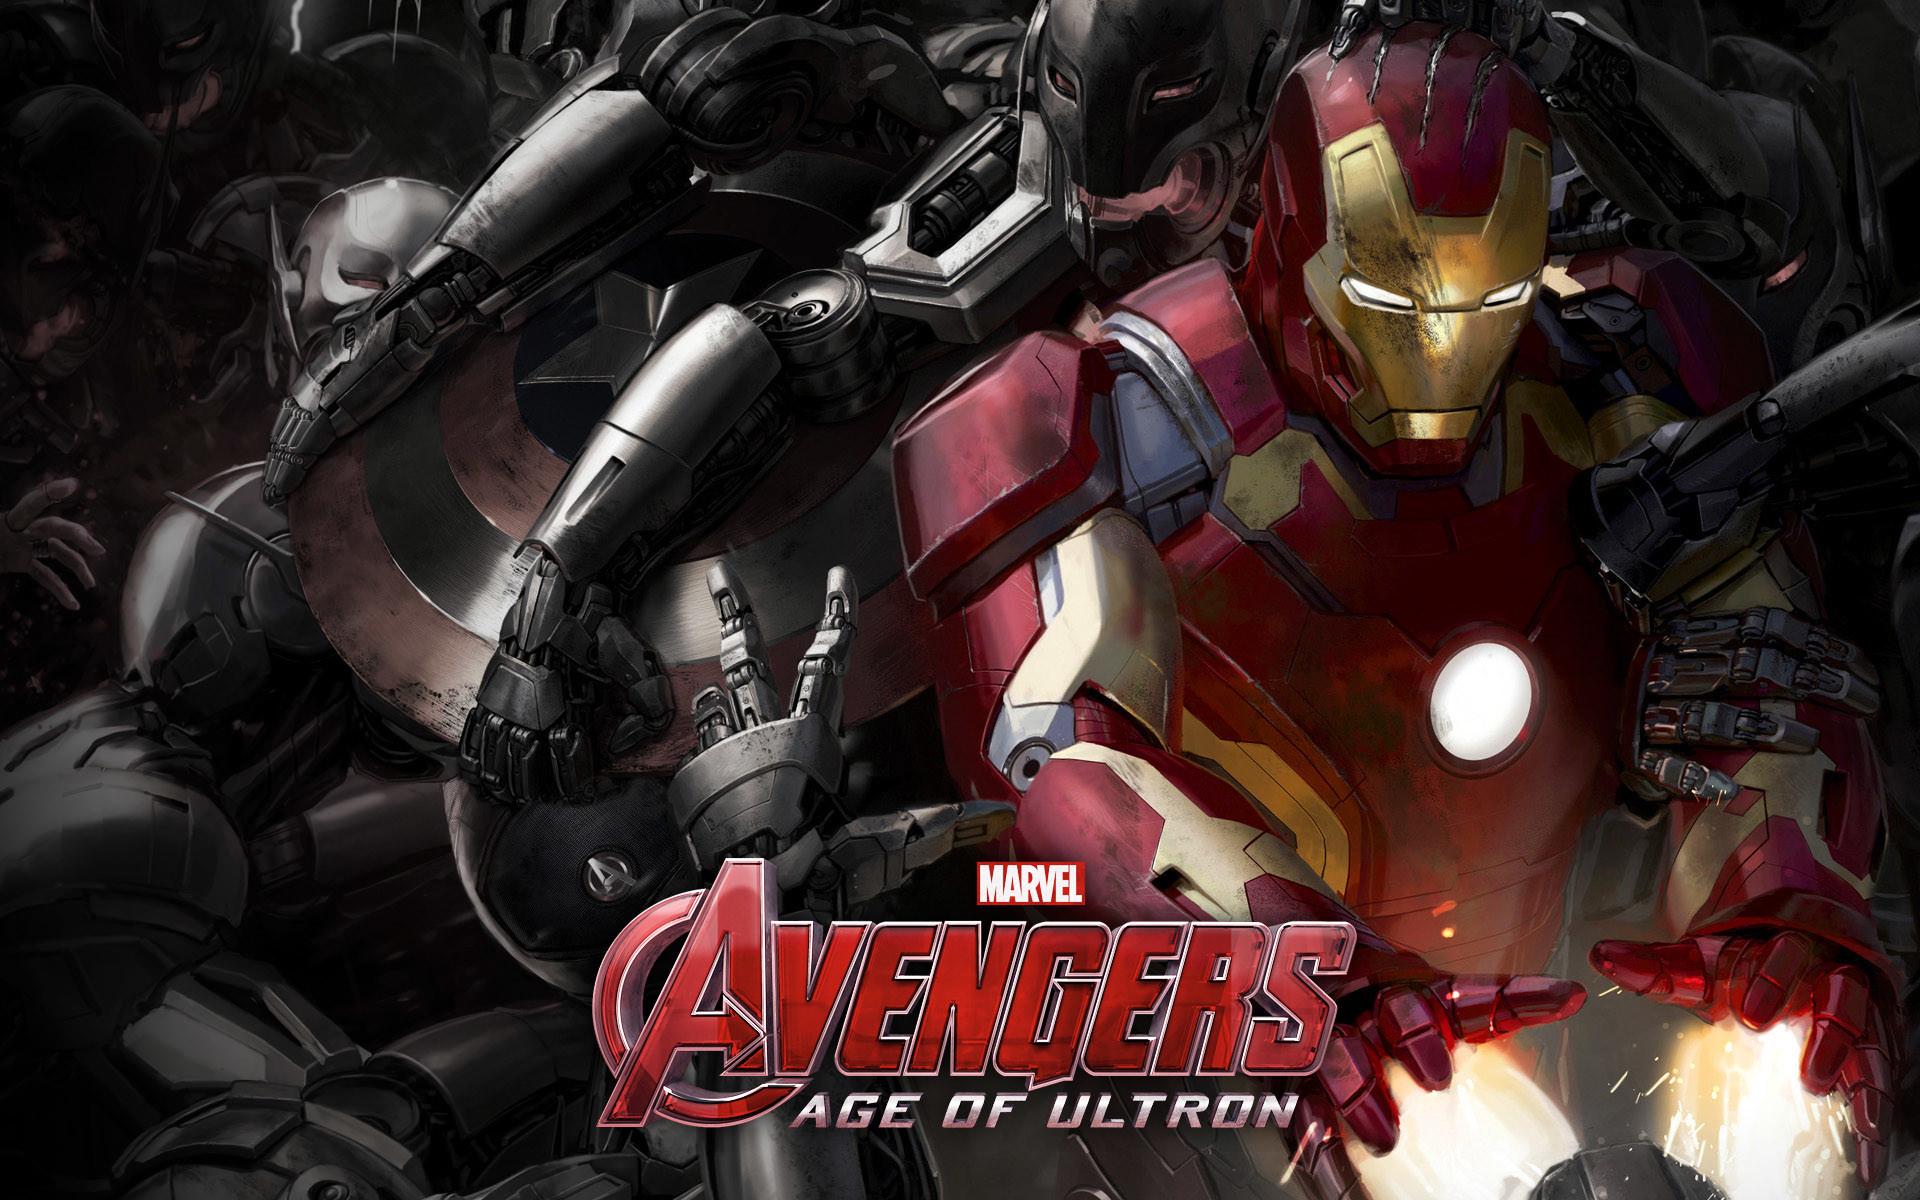 1920x1080 Avengers Age Of Ultron Wallpaper High Resolution